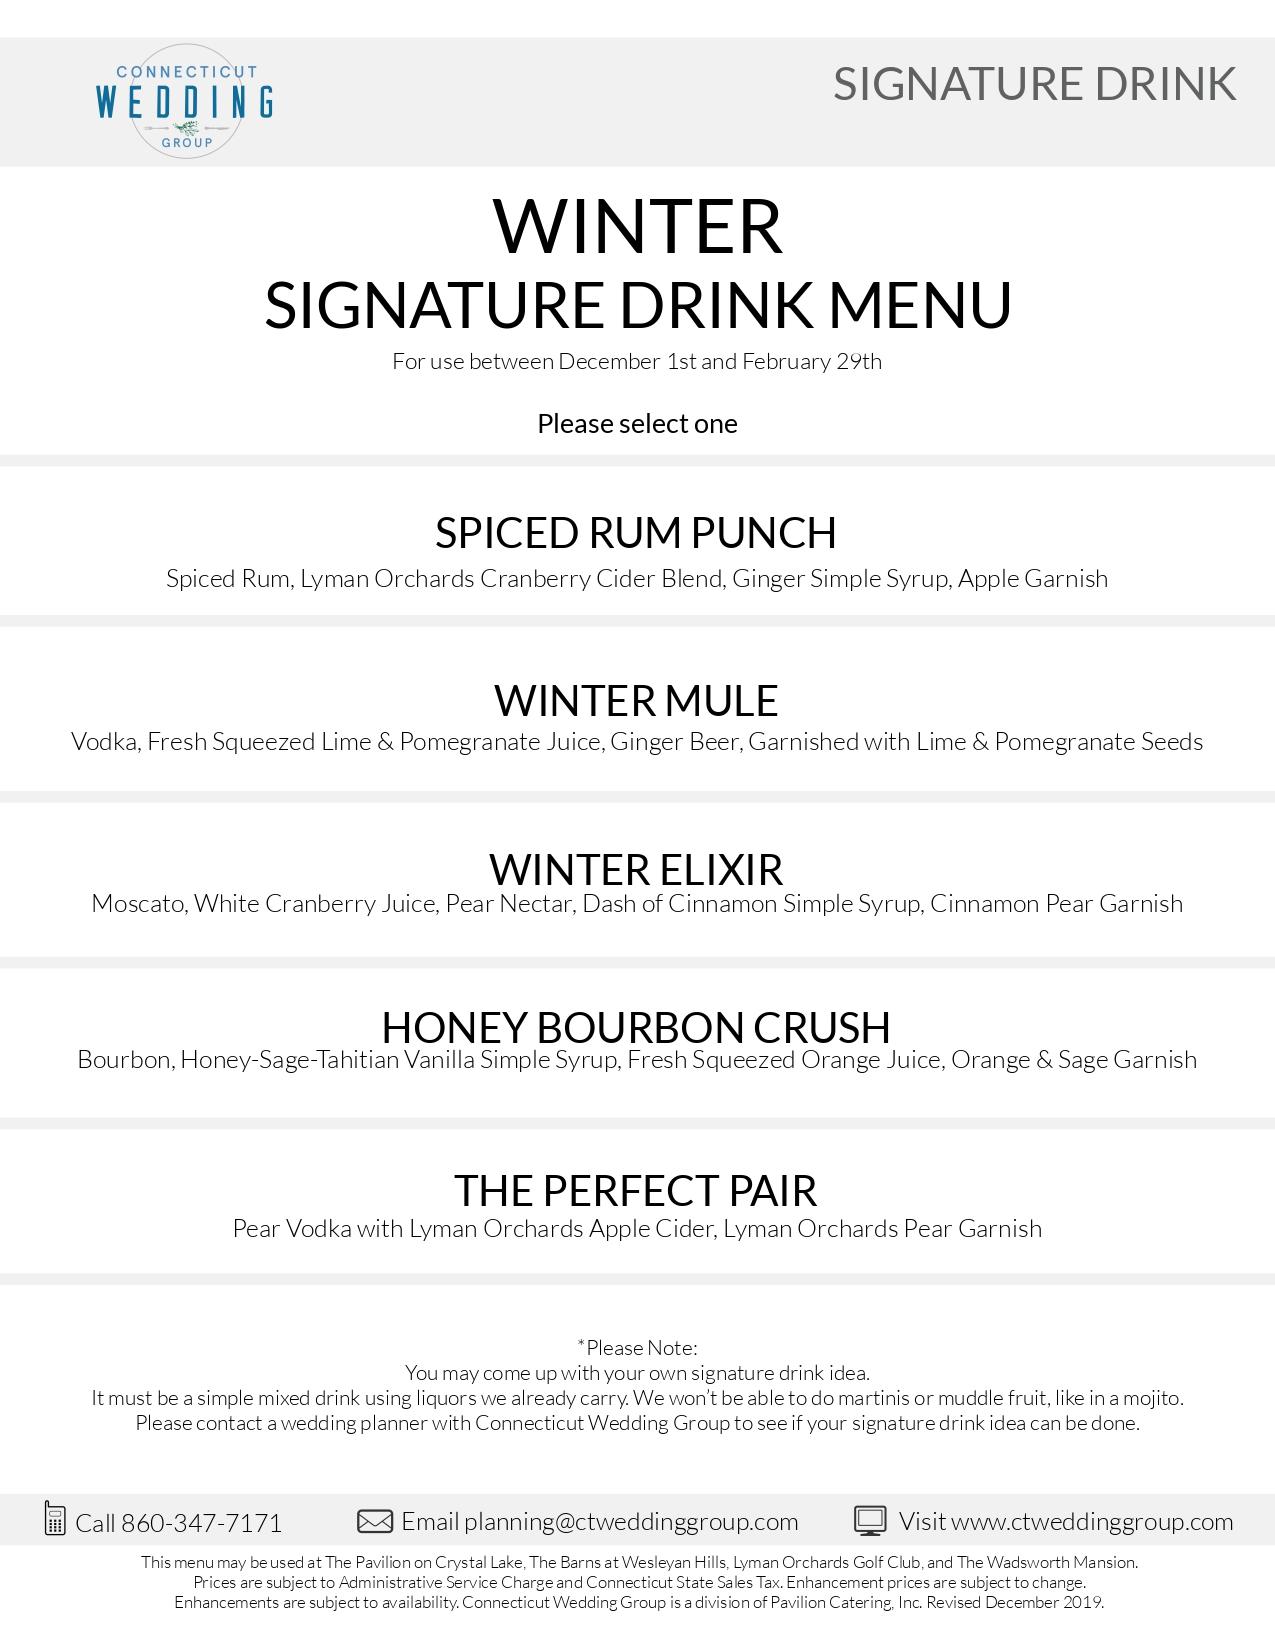 Winter-Signature-Drink-Menu_2022_page-0001